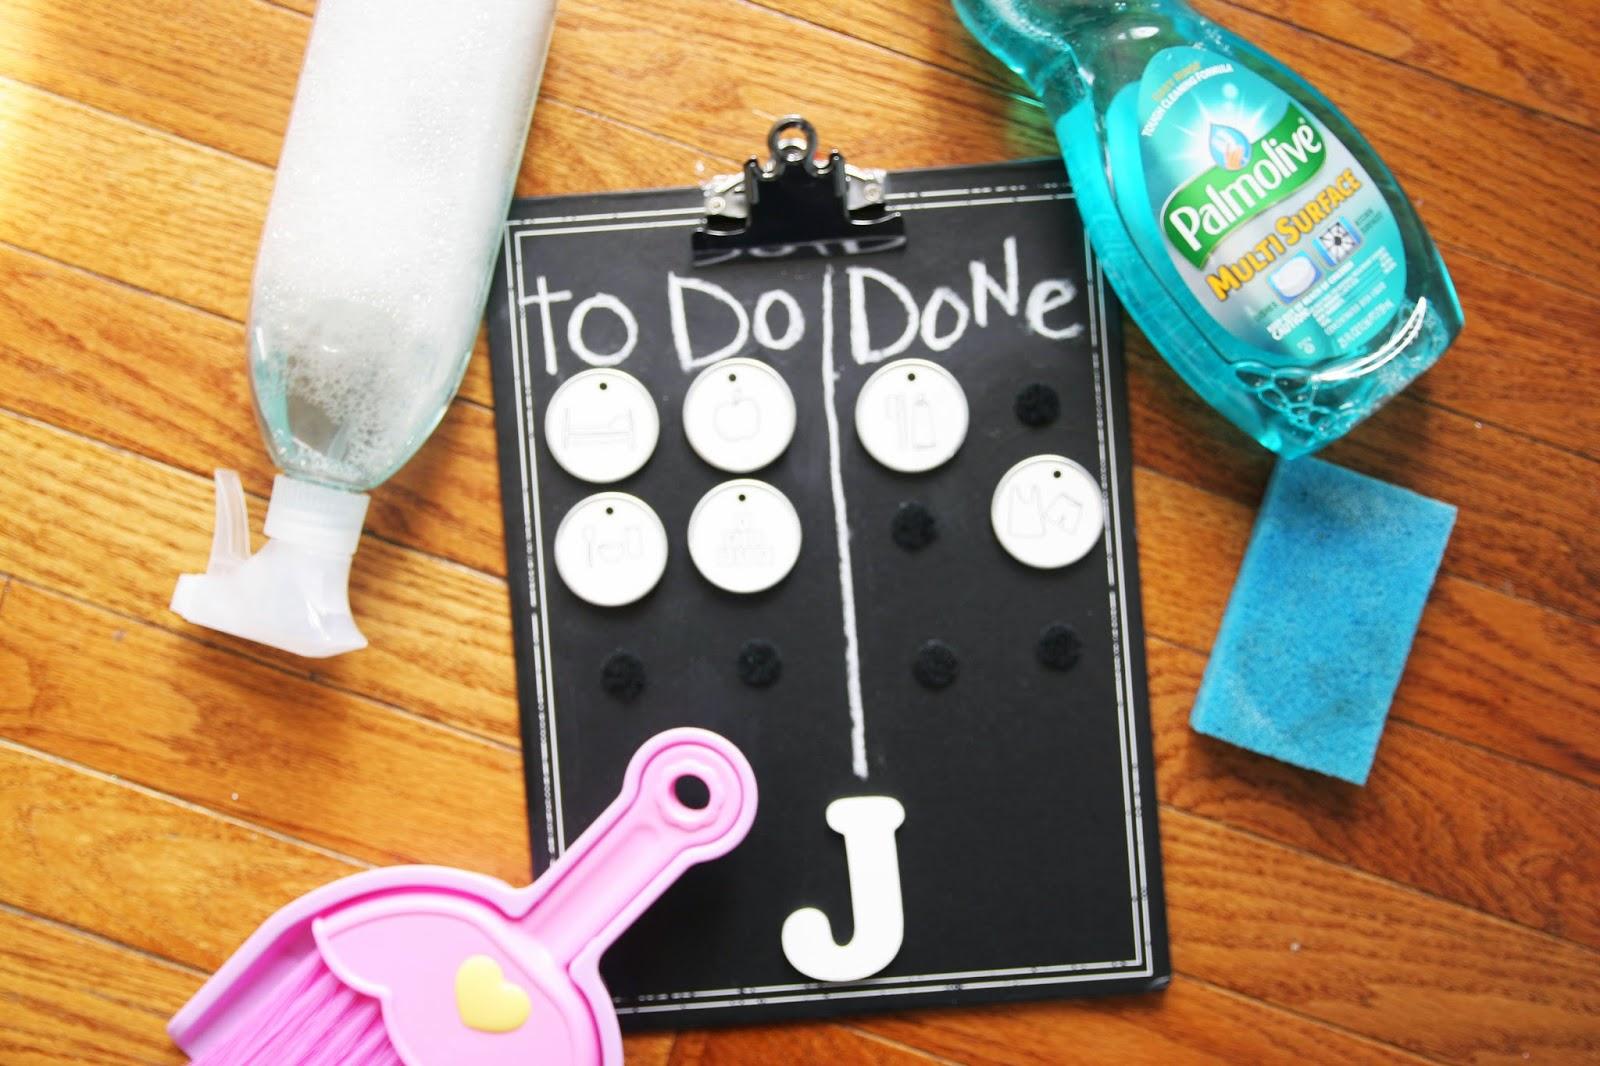 DIY velcro chore charts